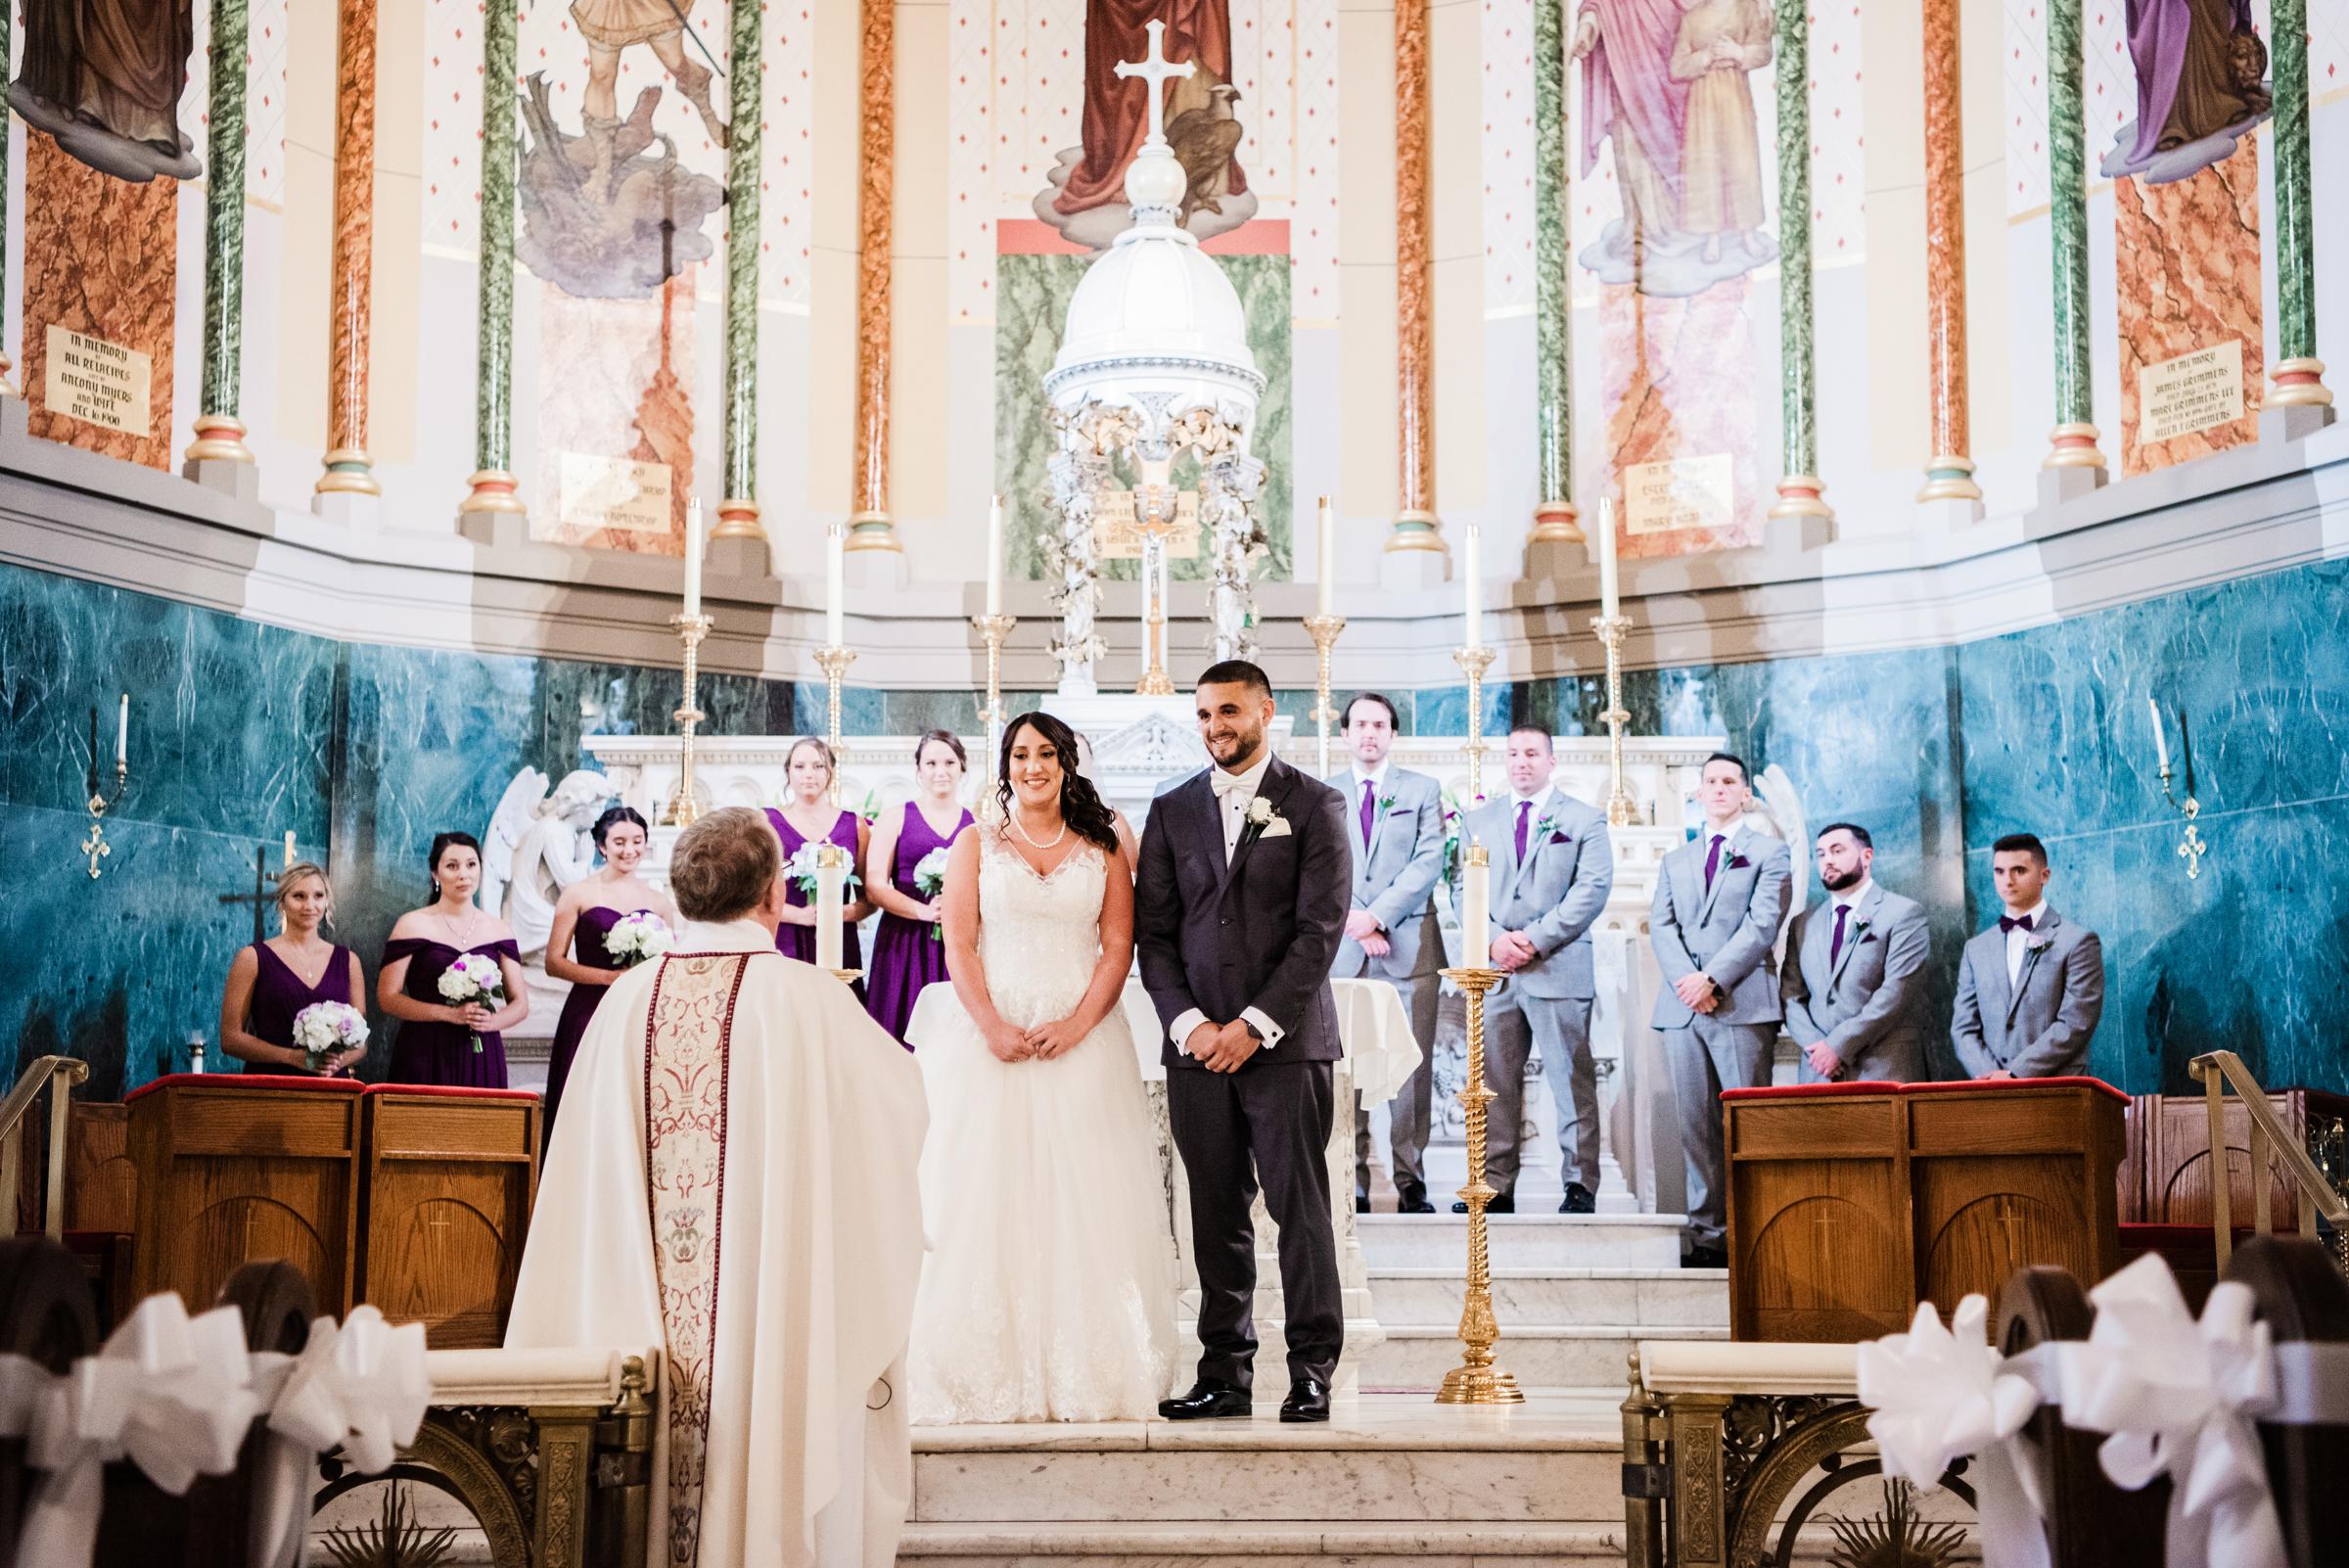 Historic_Old_St_Johns_Church_Valentinos_Banquet_Hall_Central_NY_Wedding_JILL_STUDIO_Rochester_NY_Photographer_DSC_5769.jpg